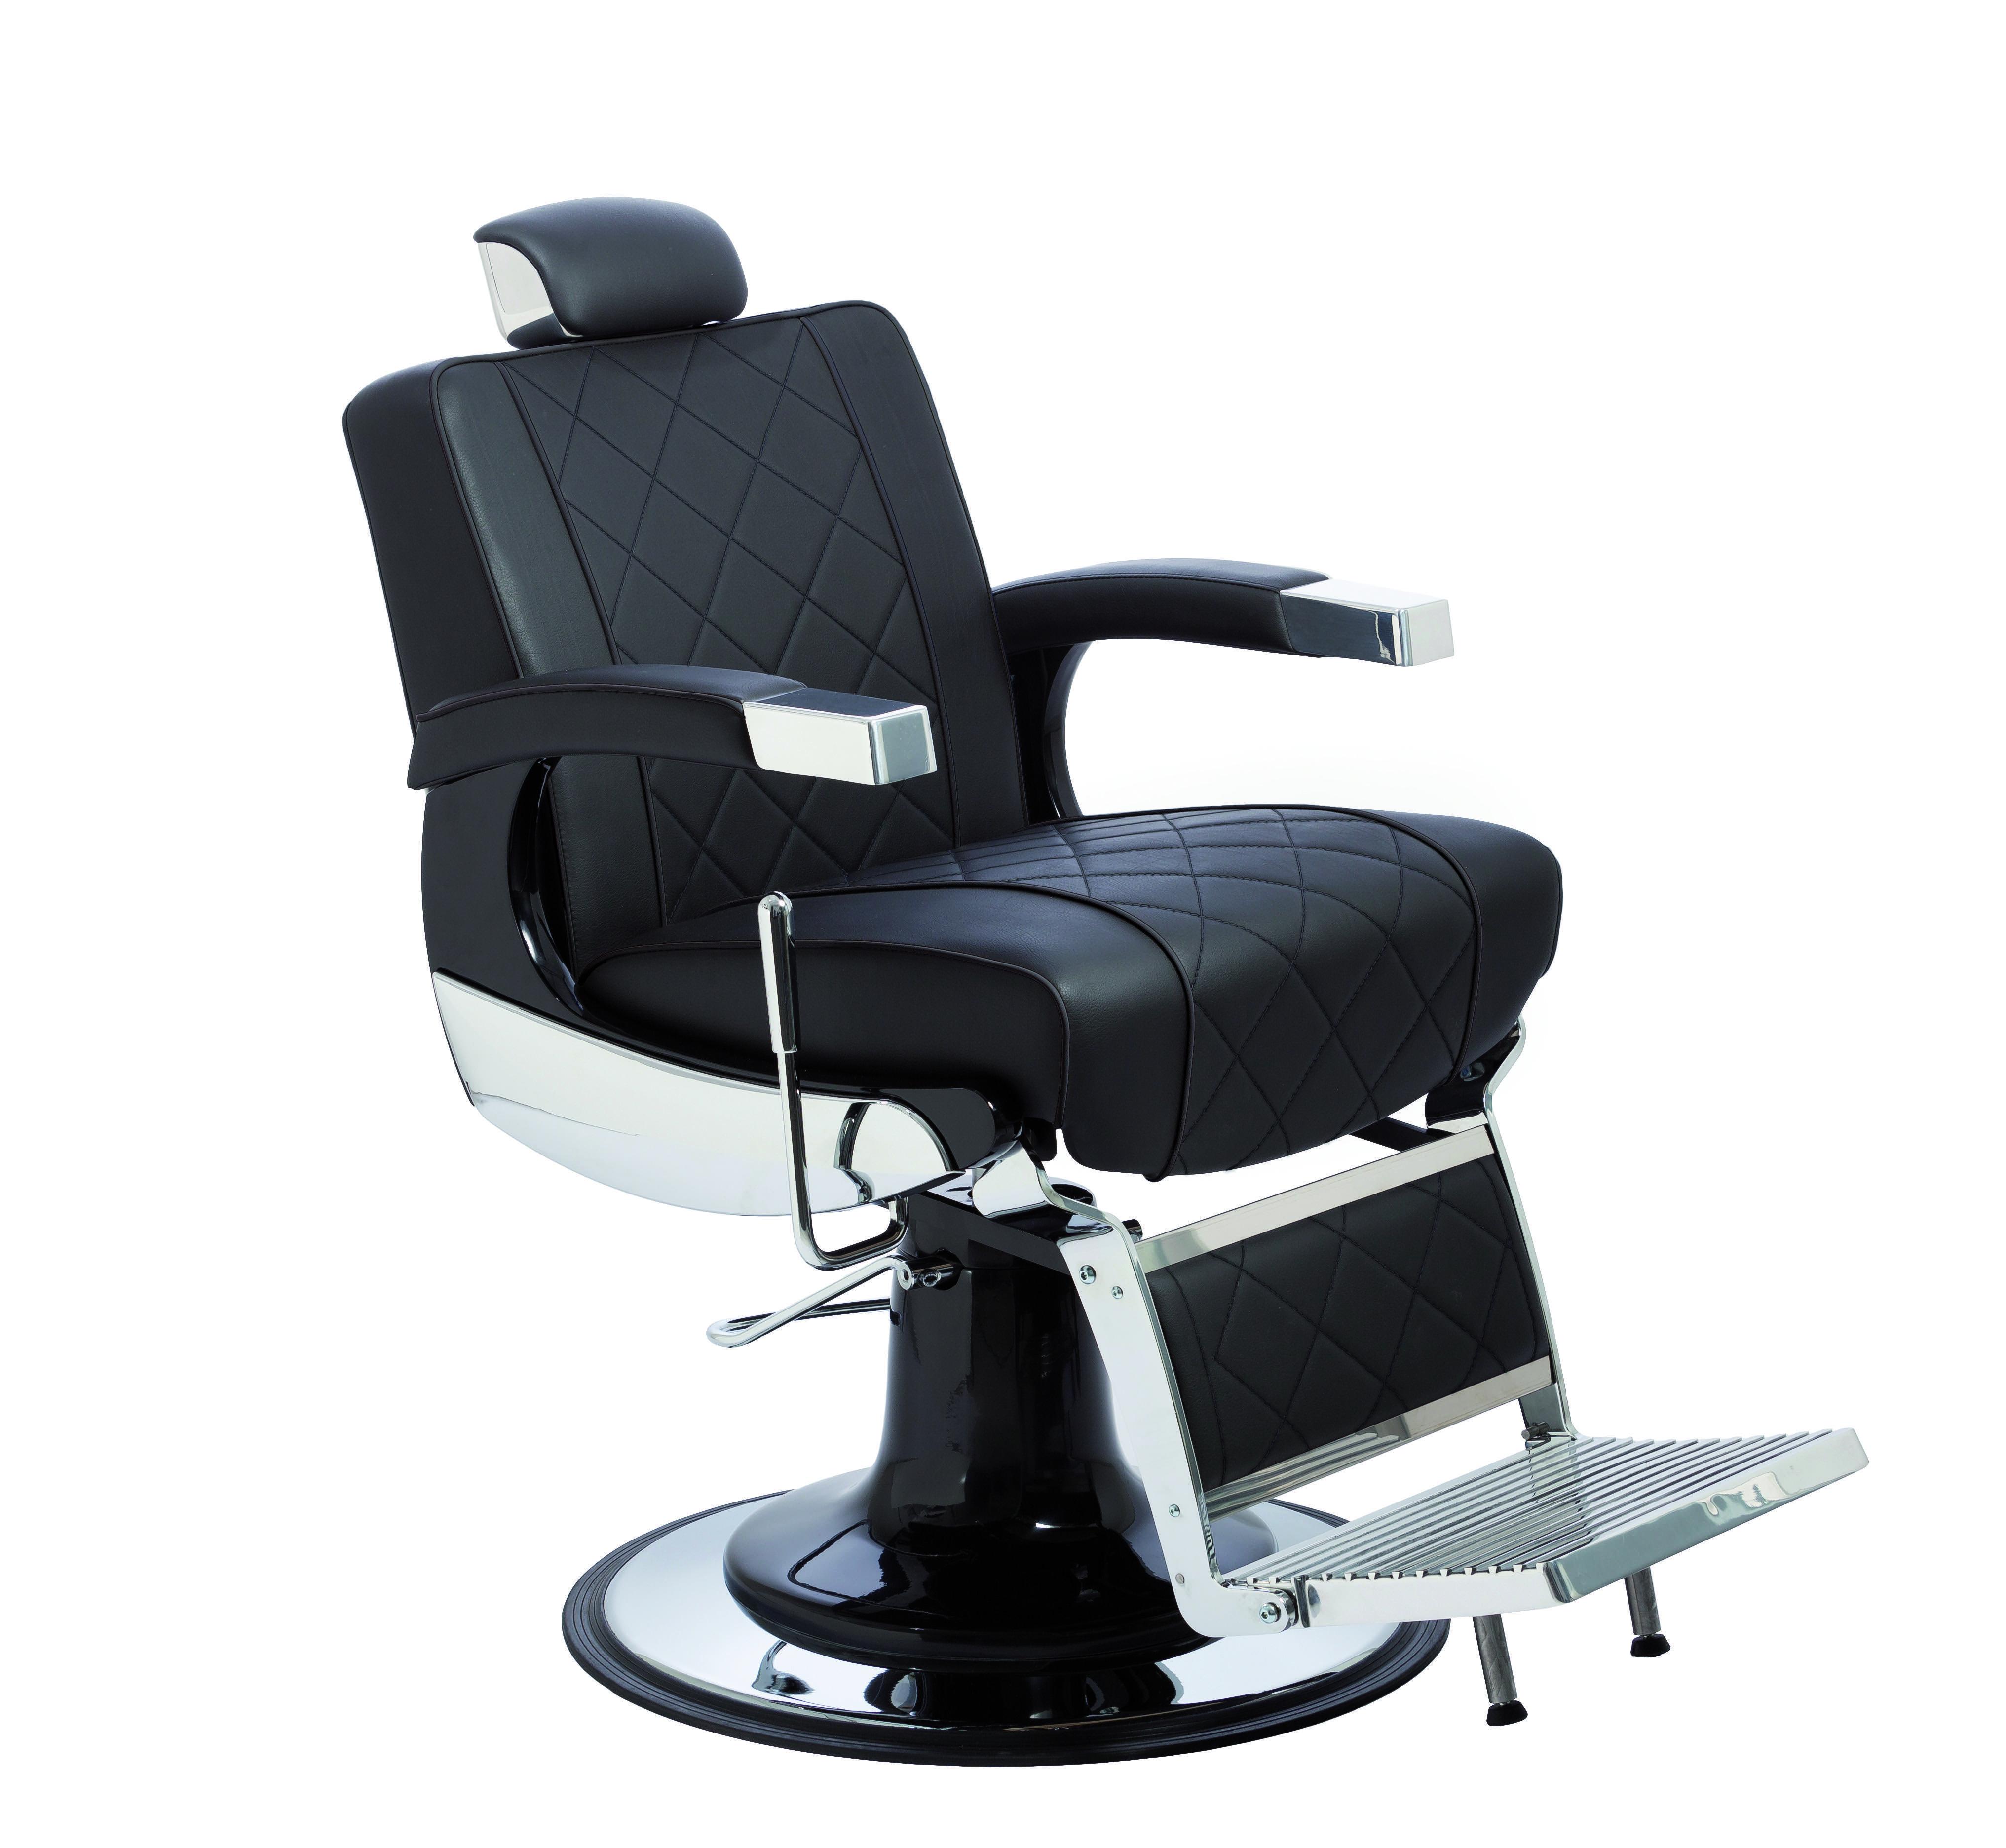 Grau Salon Stuhle Modern Salon Stuhle Barbing Salon Ausrustung Antik Friseur Stuhle Zum Verkauf Friseur Stuhl 2 Hand Stuhle Barber Chair Chair Decor